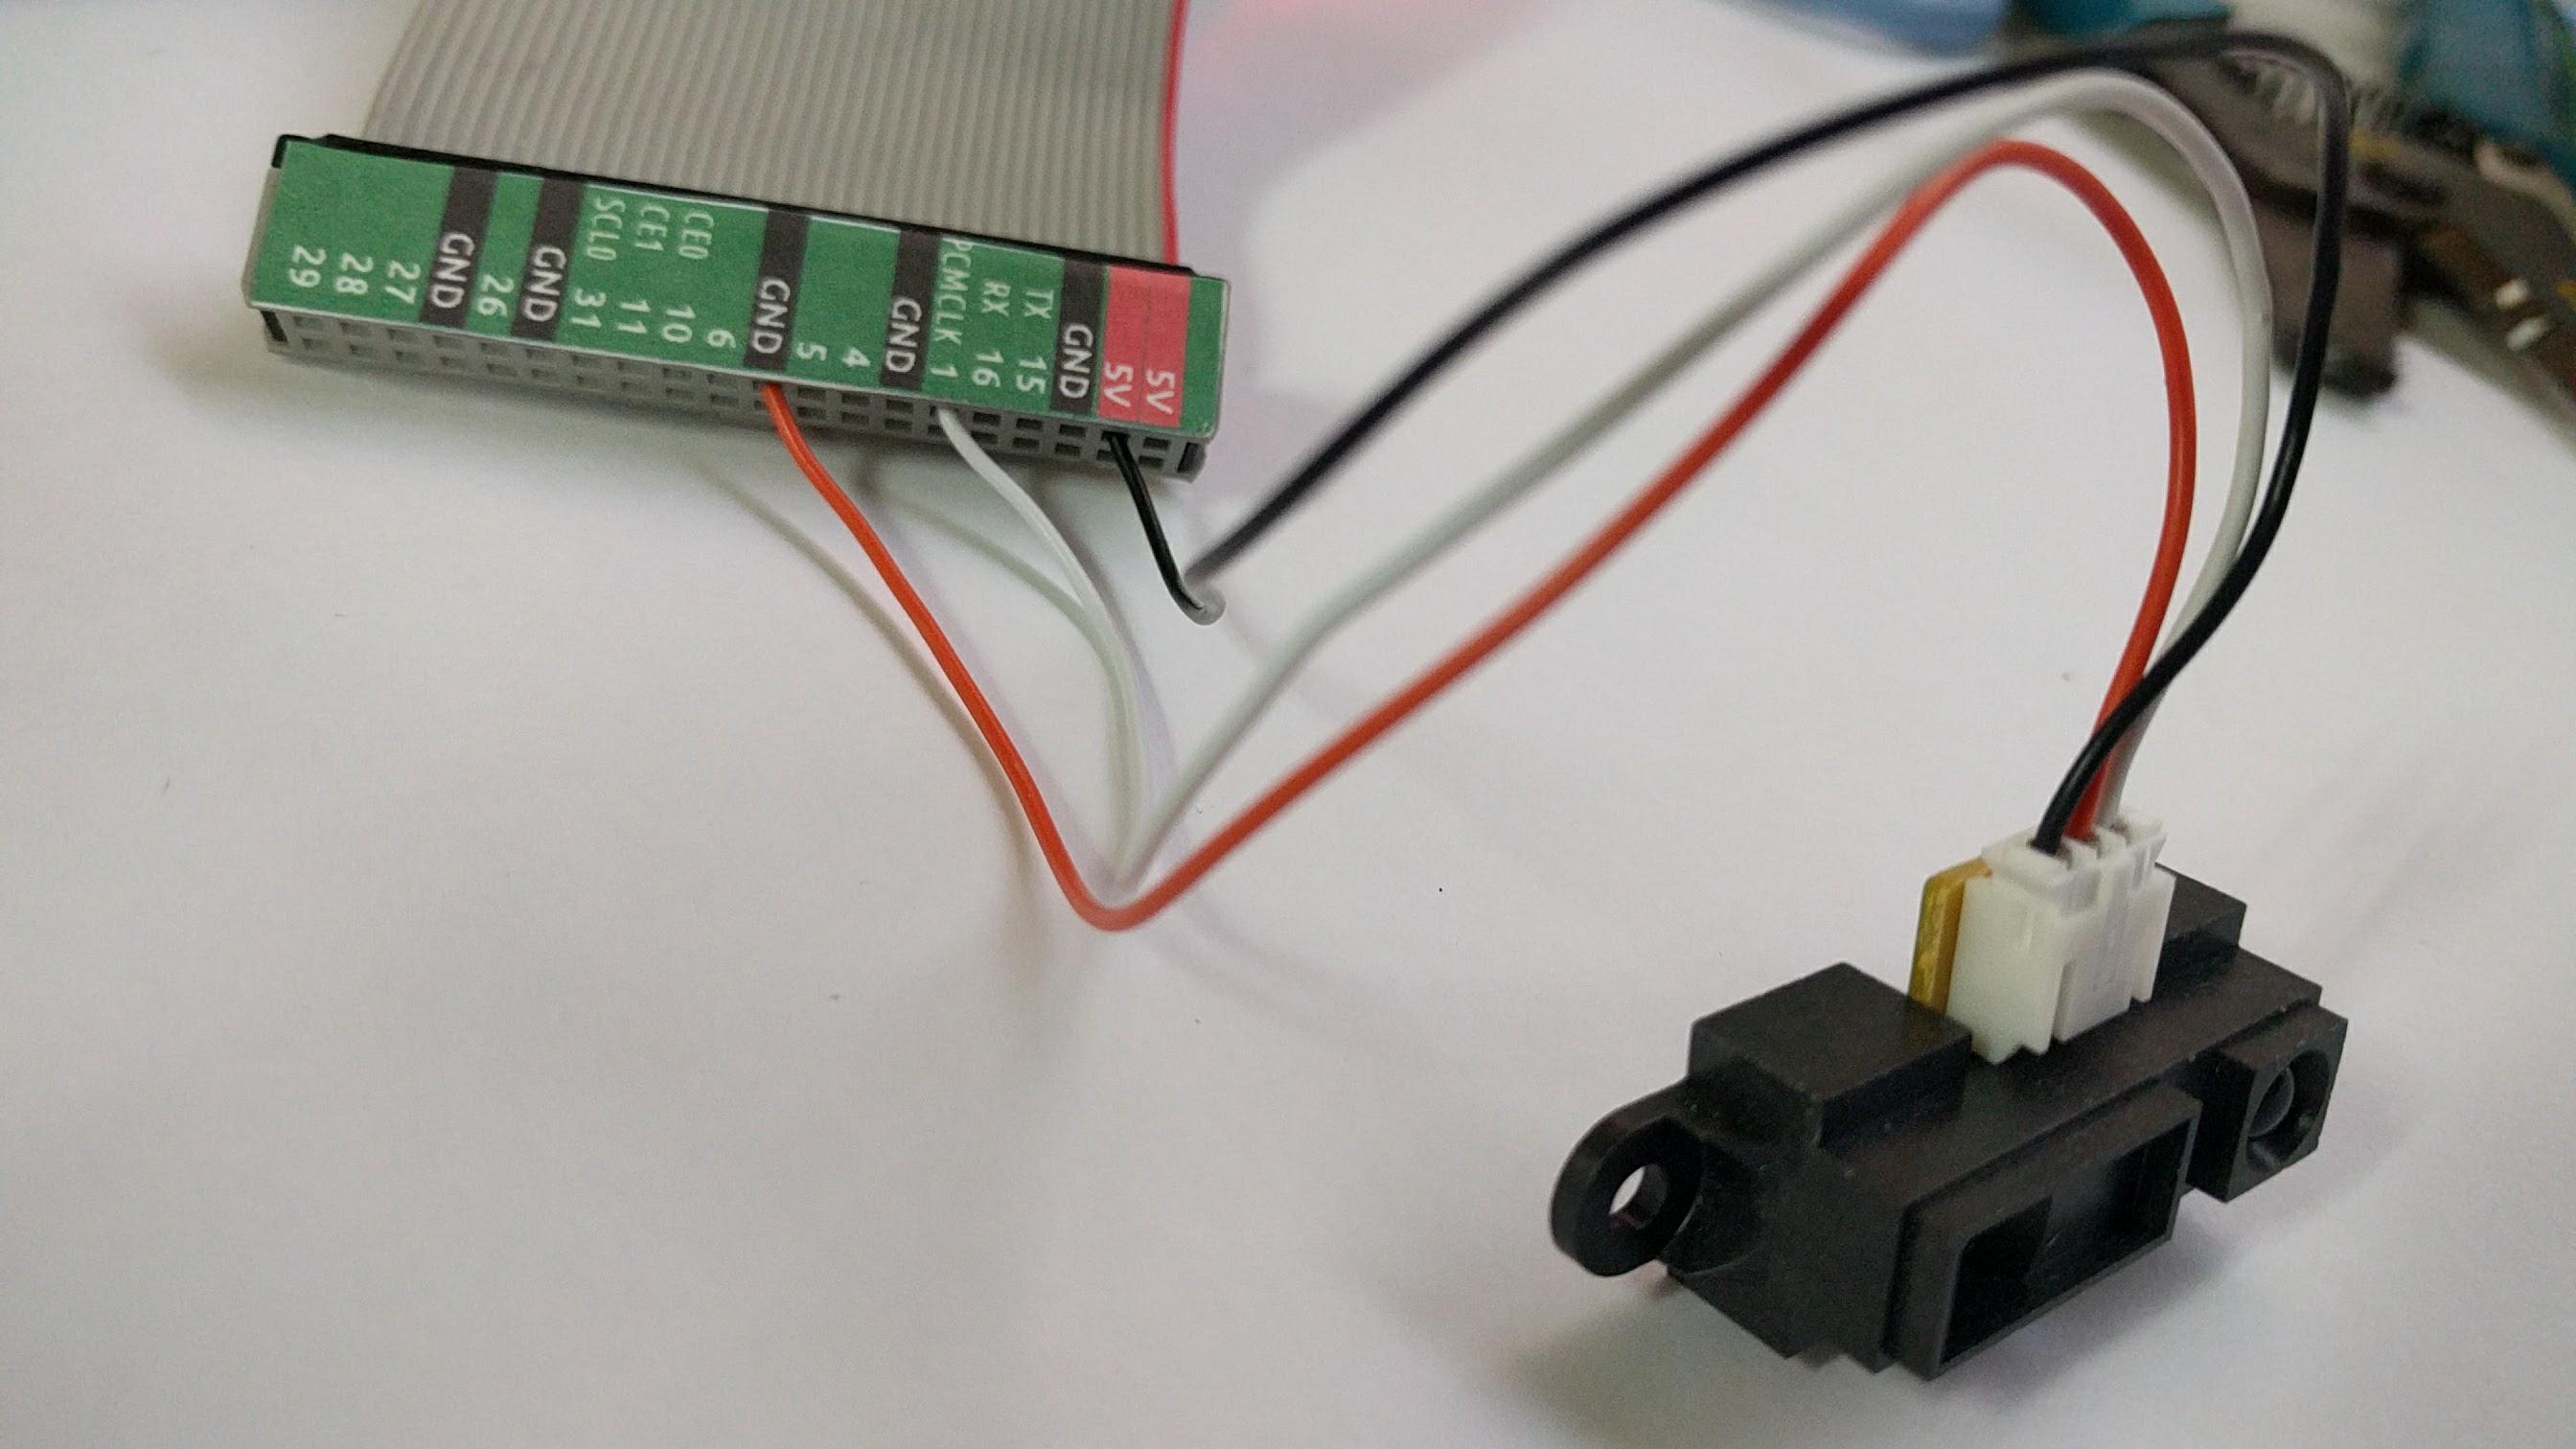 Python で WiringPi とお気楽電子工作 - Qiita